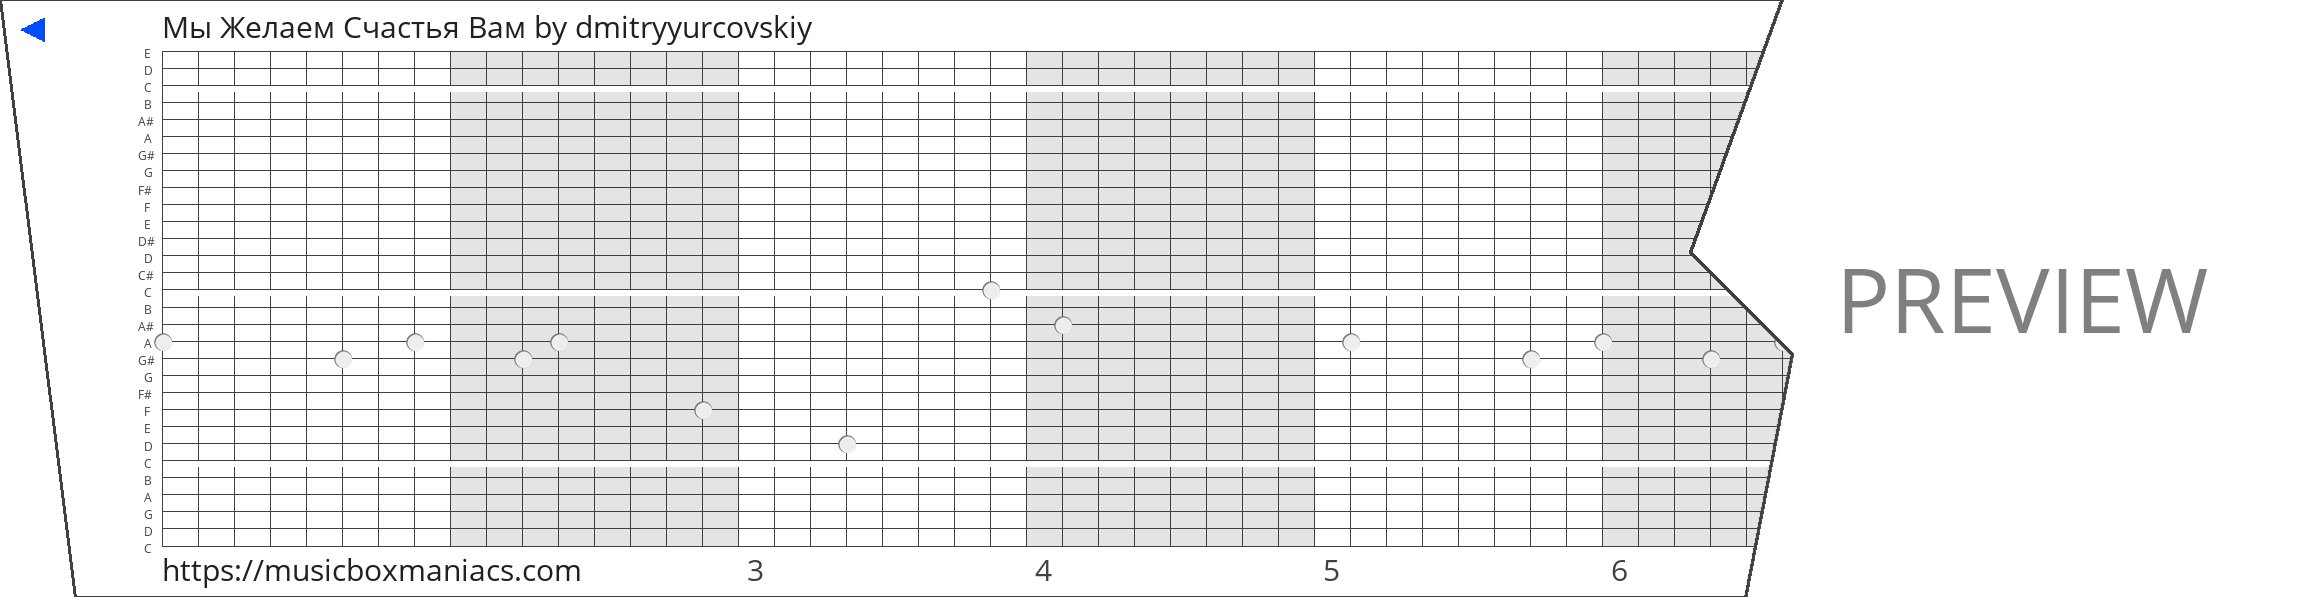 Мы Желаем Счастья Вам 30 note music box paper strip